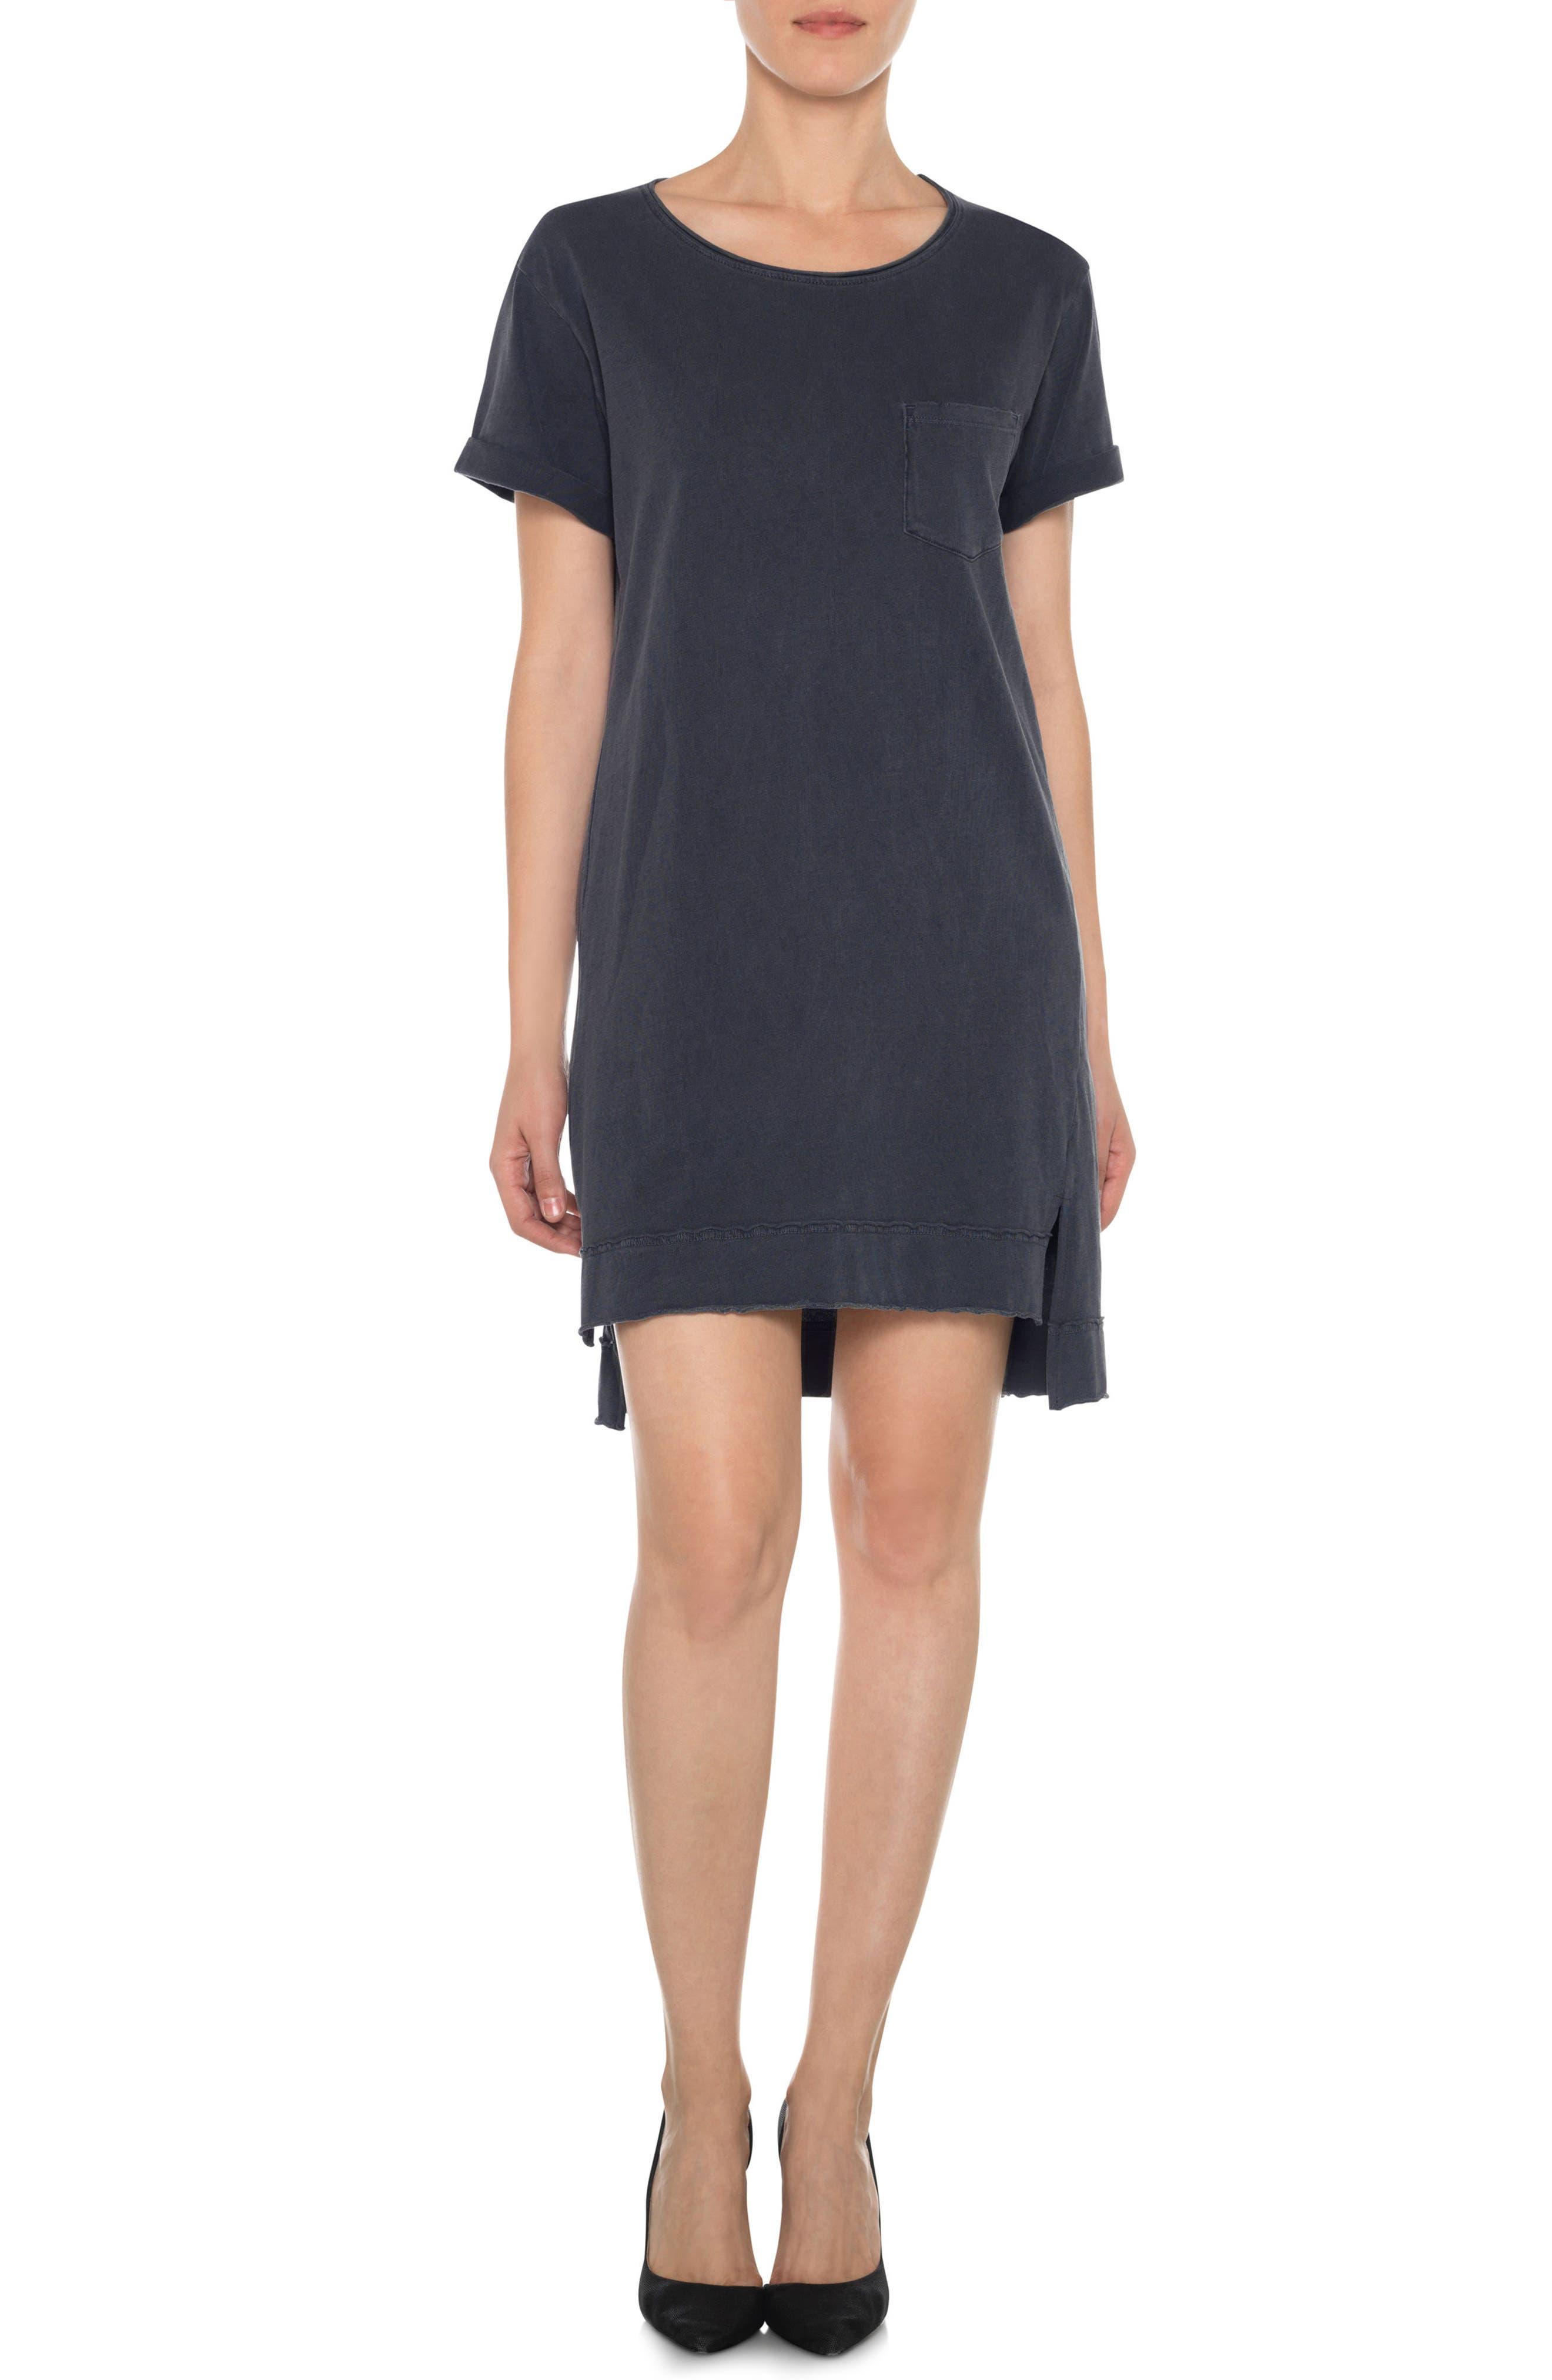 Alternate Image 1 Selected - Joe's Nixie T-Shirt Dress